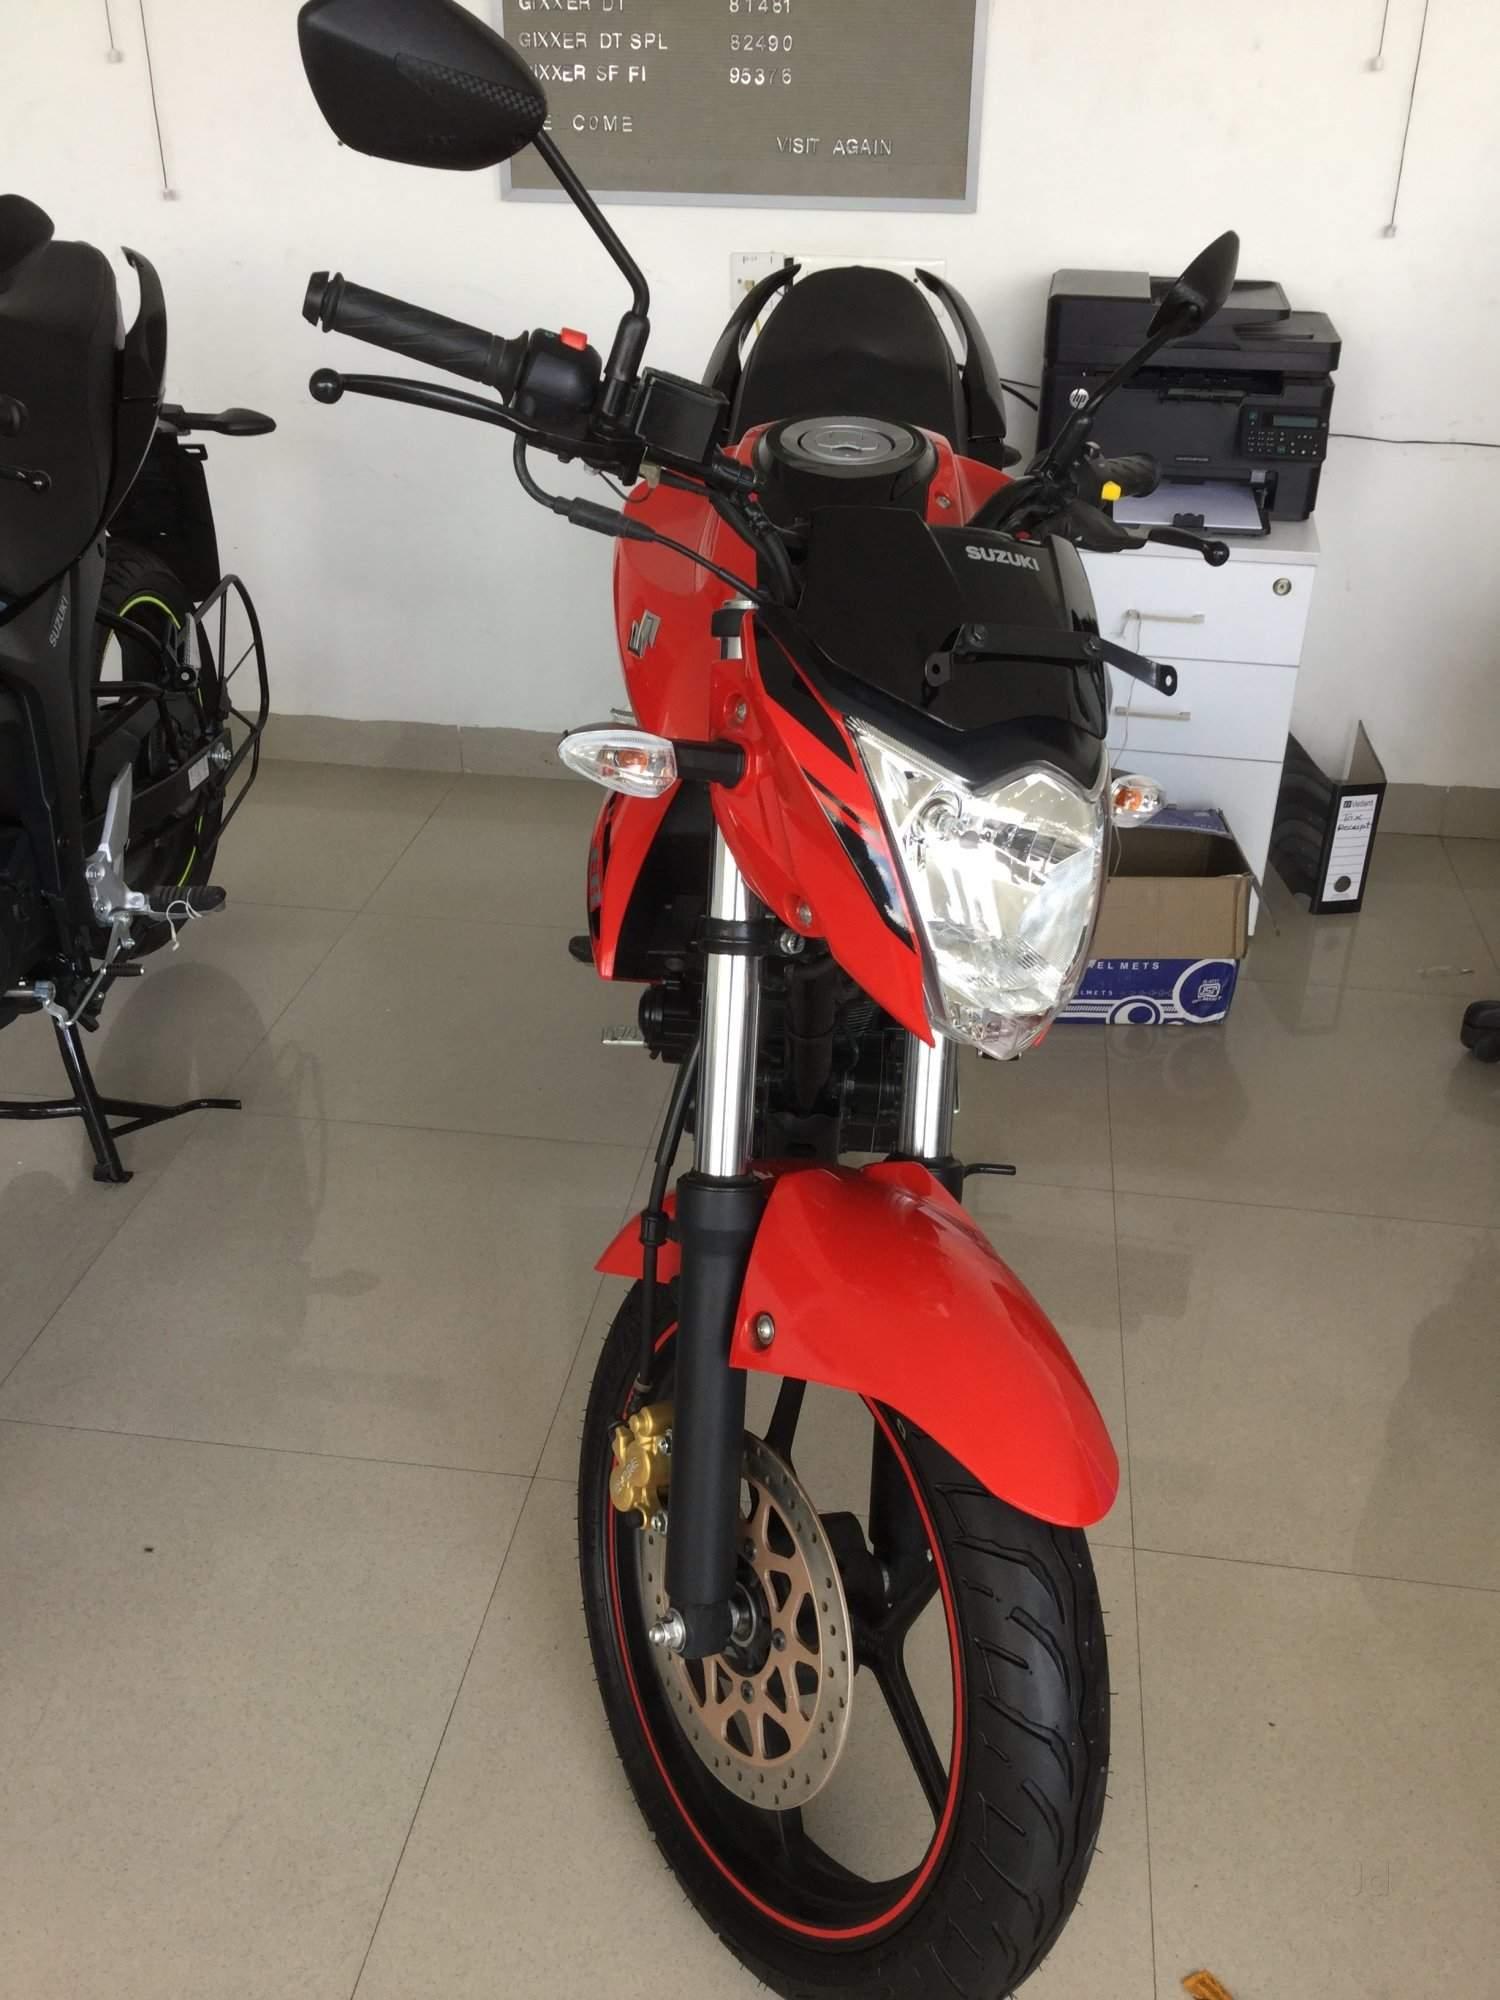 Top 100 Suzuki Motorcycle Repair & Services in Hadapsar - Best